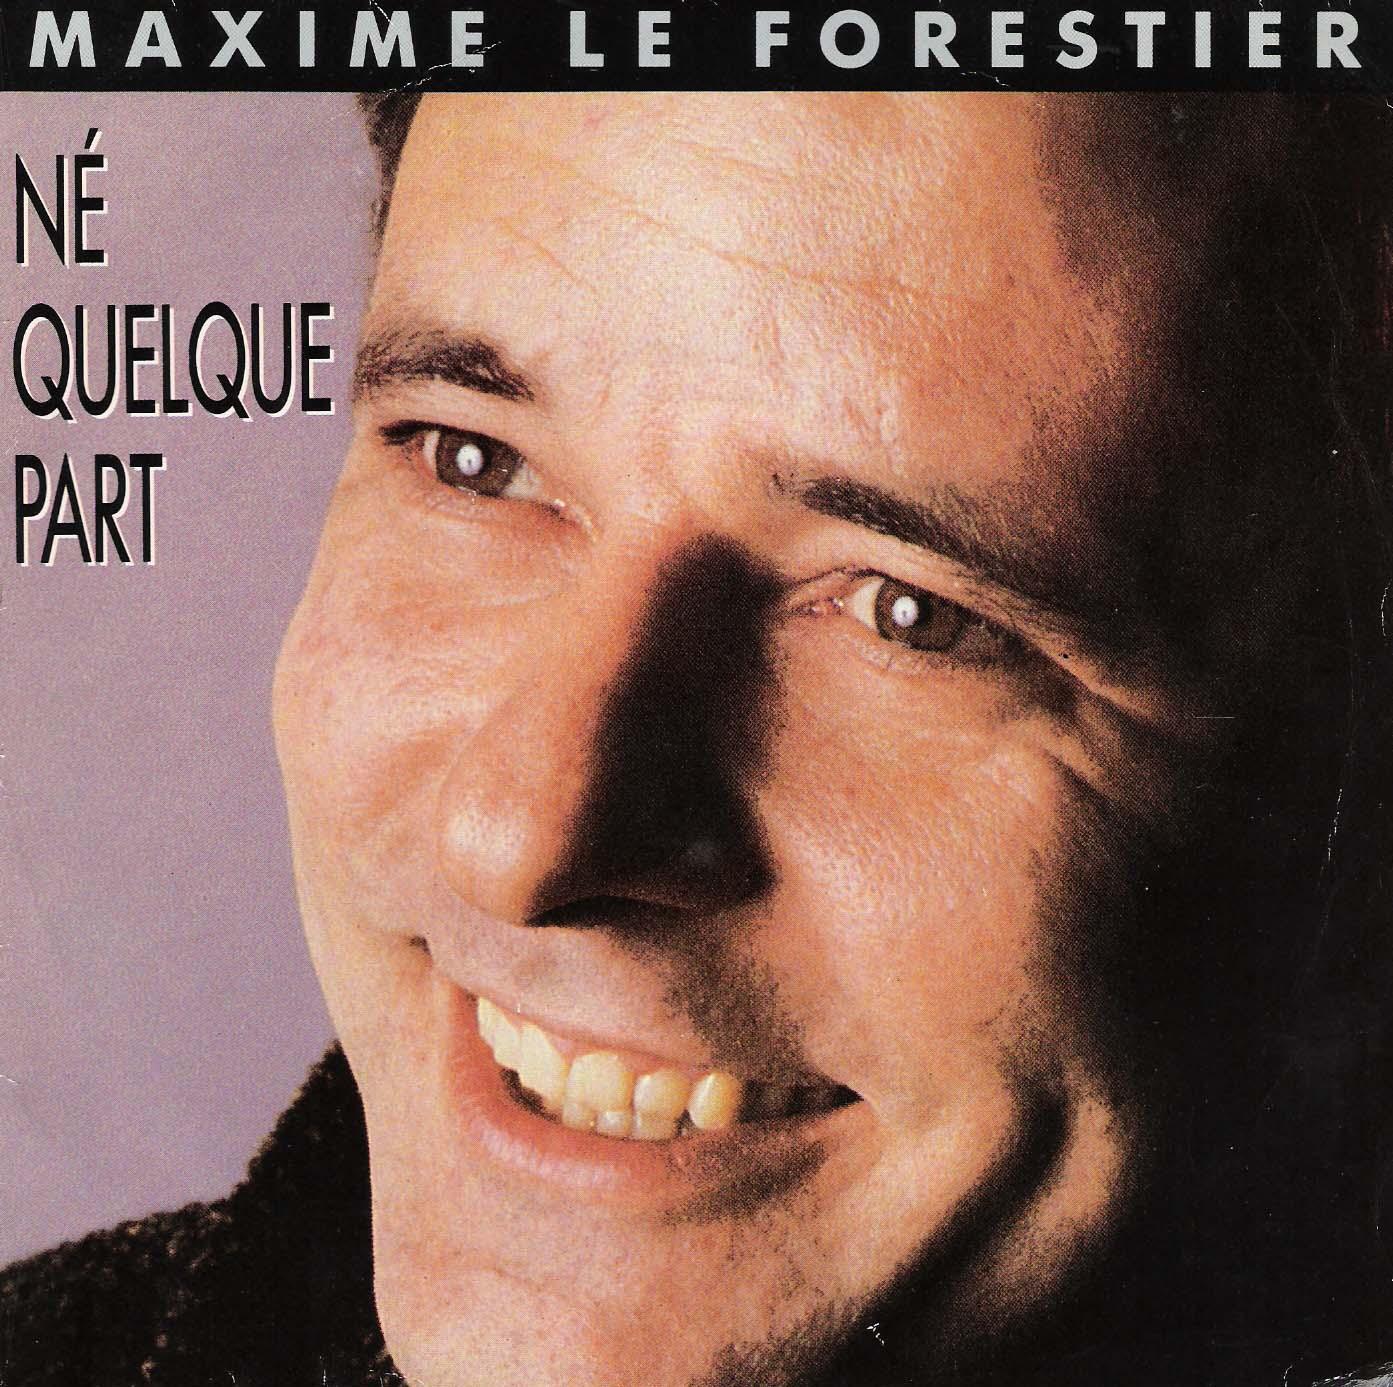 Amis Maxime <b>Le Forestier</b> - Amis+Maxime+Le+Forestier0